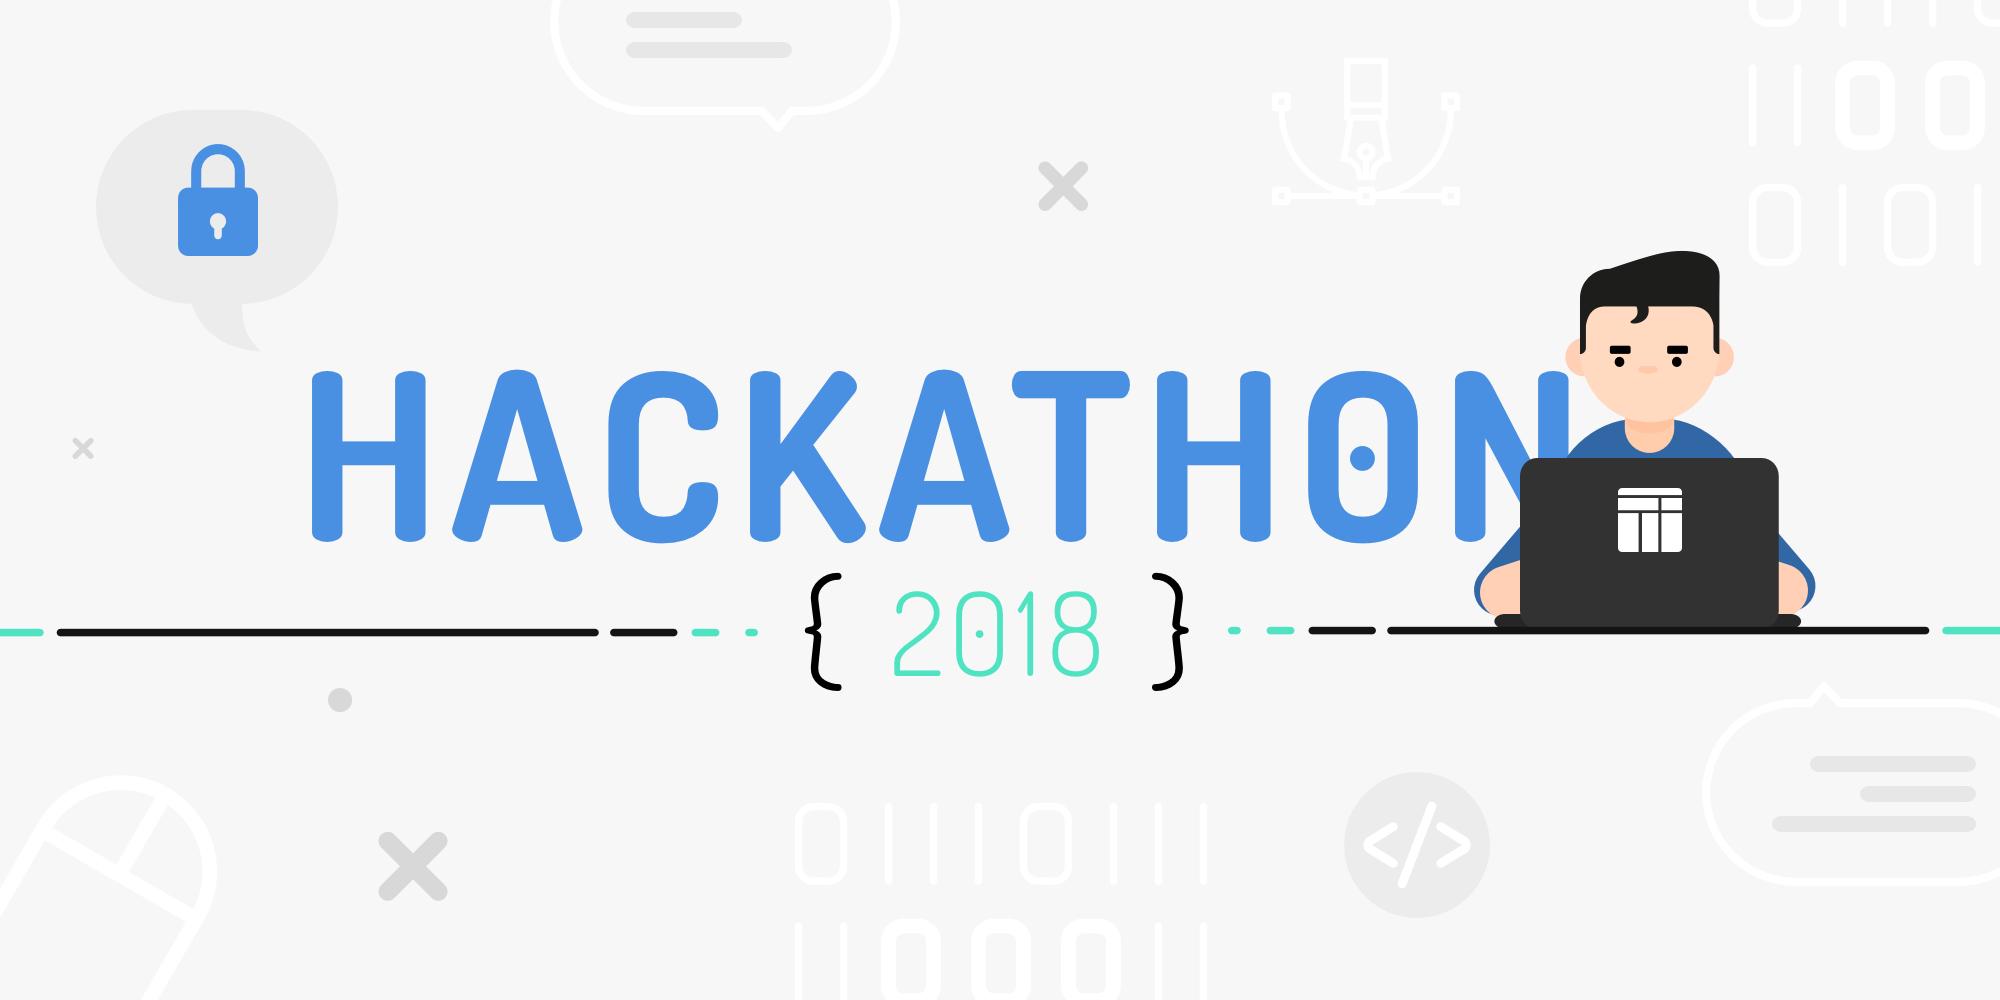 TTT Hackathon 2018 illustration